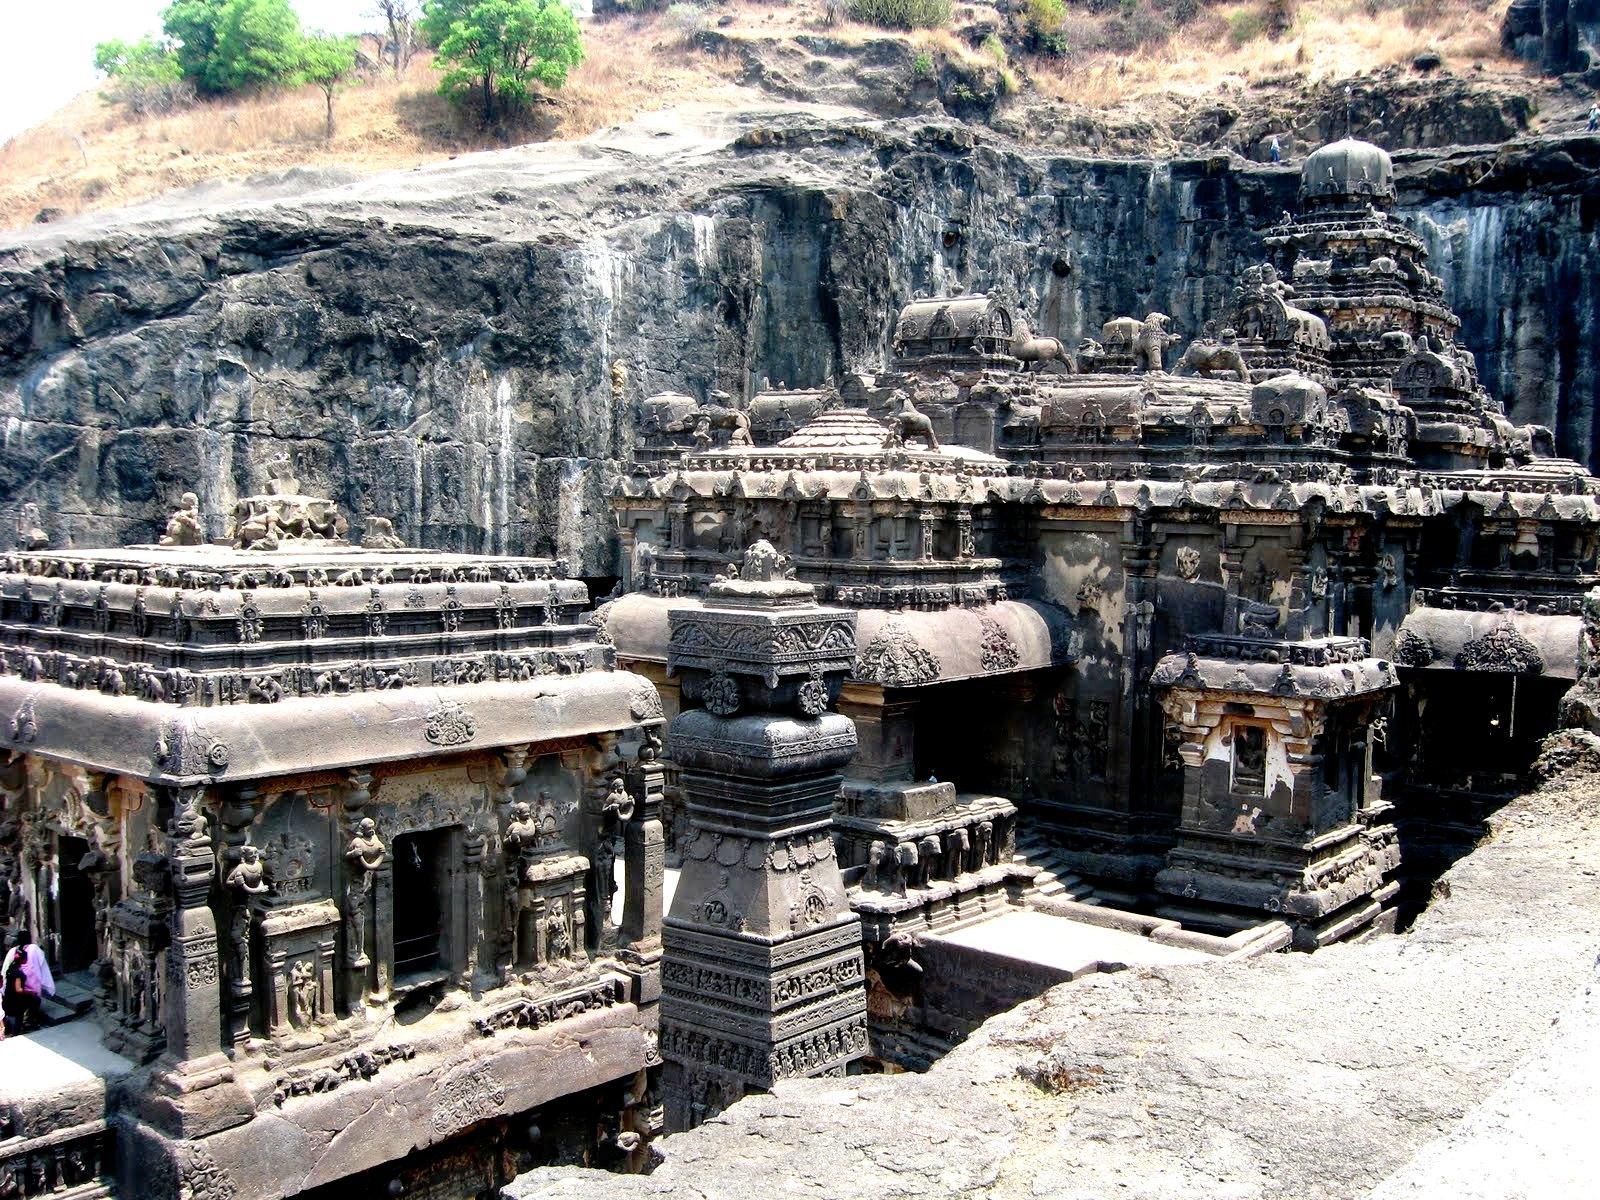 храм кайлаша, вид справа